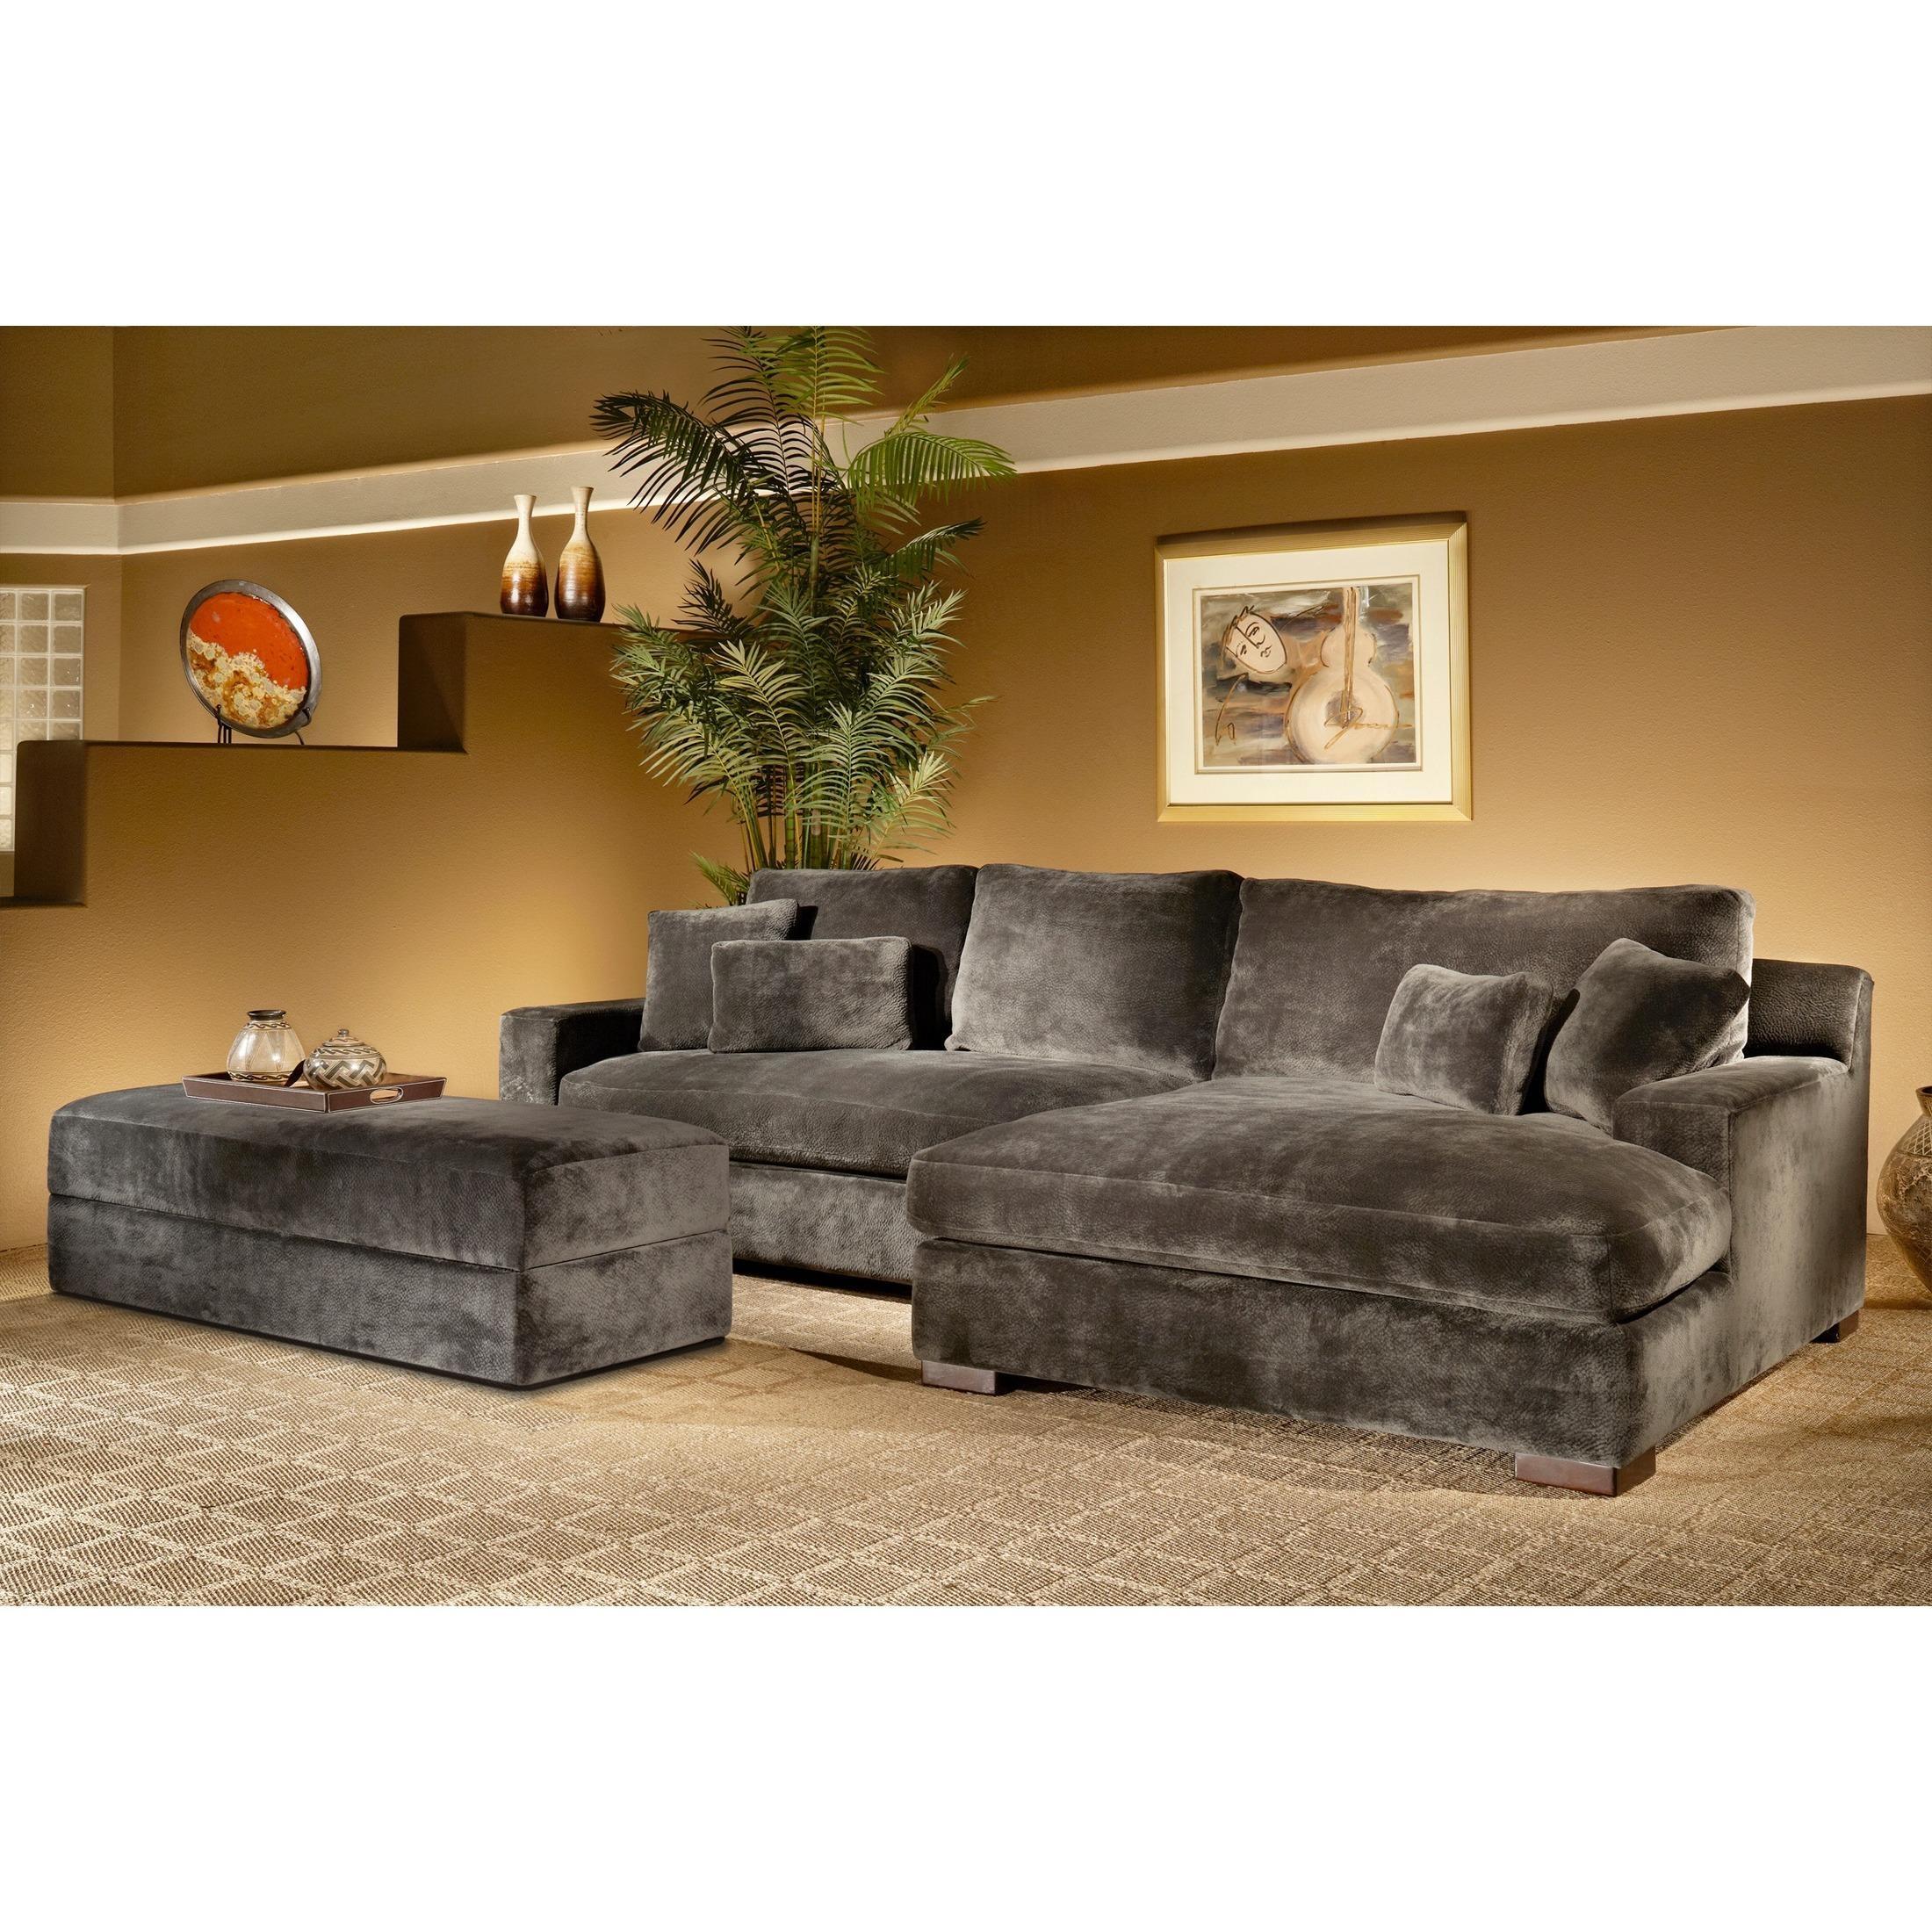 Bradley Sectional Sofa 57 With Bradley Sectional Sofa With Bradley Sectional Sofas (Image 12 of 20)